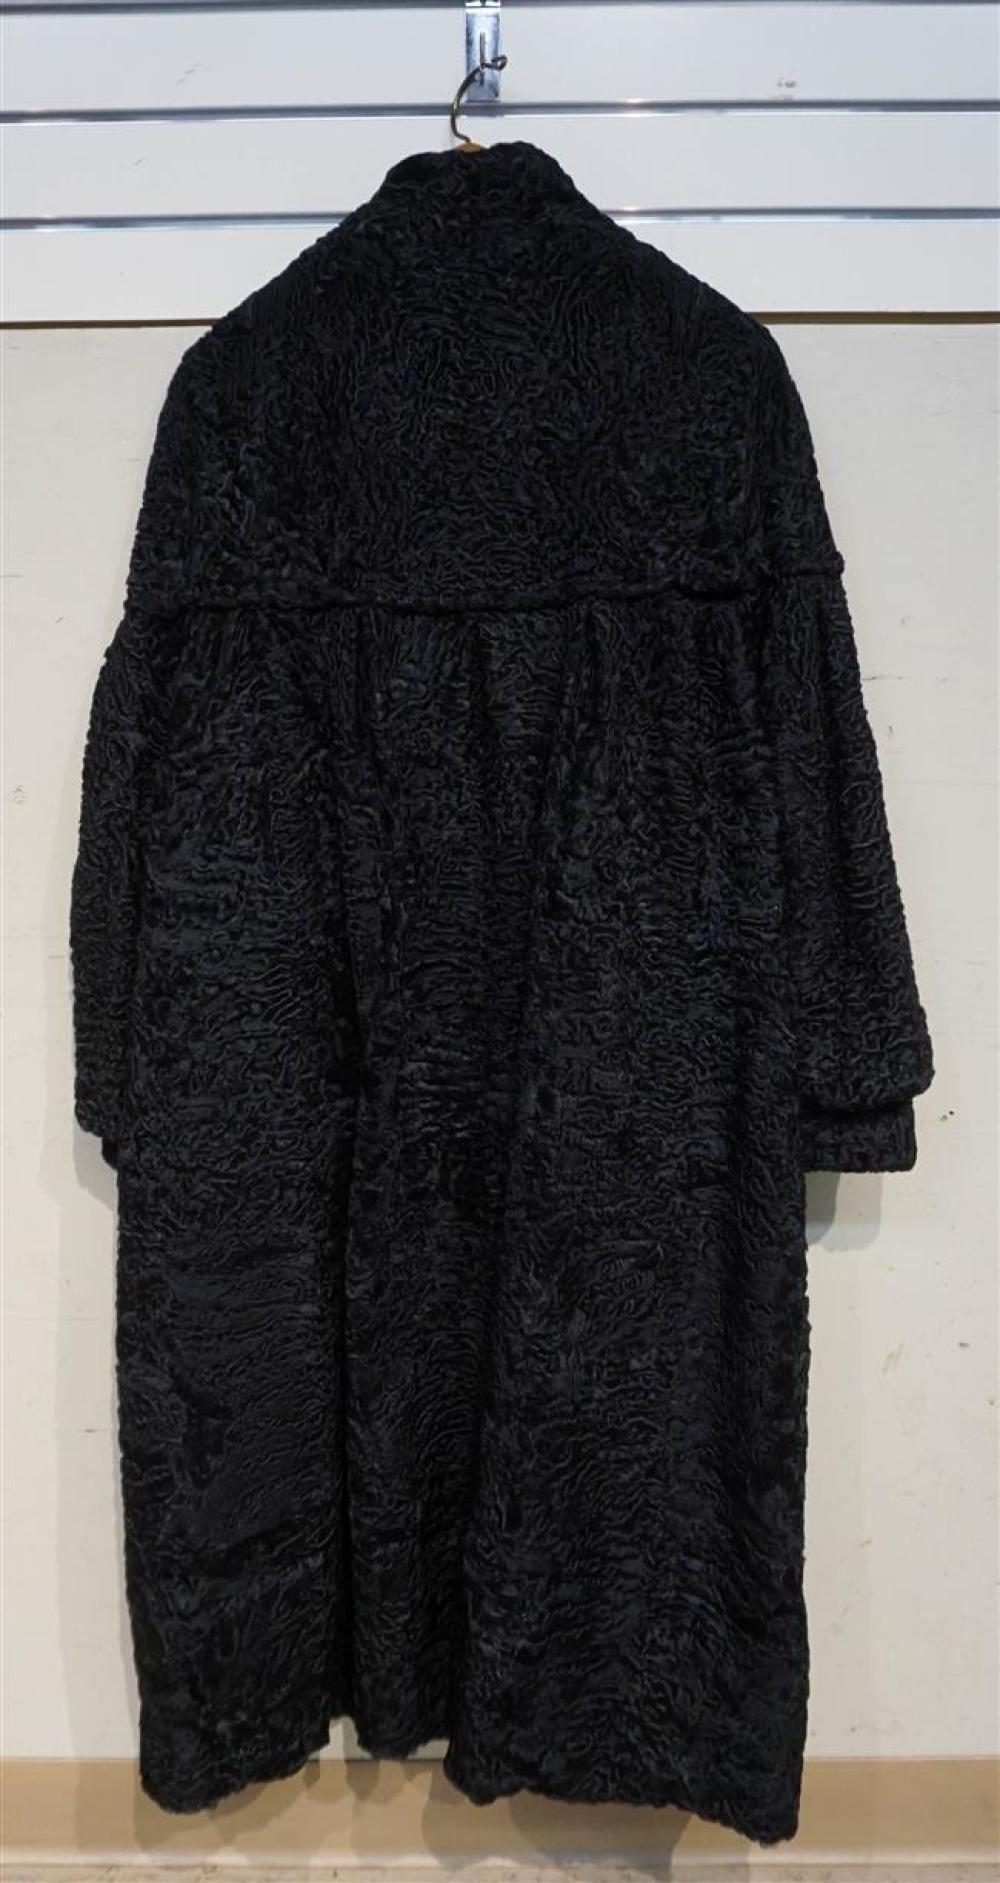 Sheared Lamb Fur Coat; Herbst Koln label